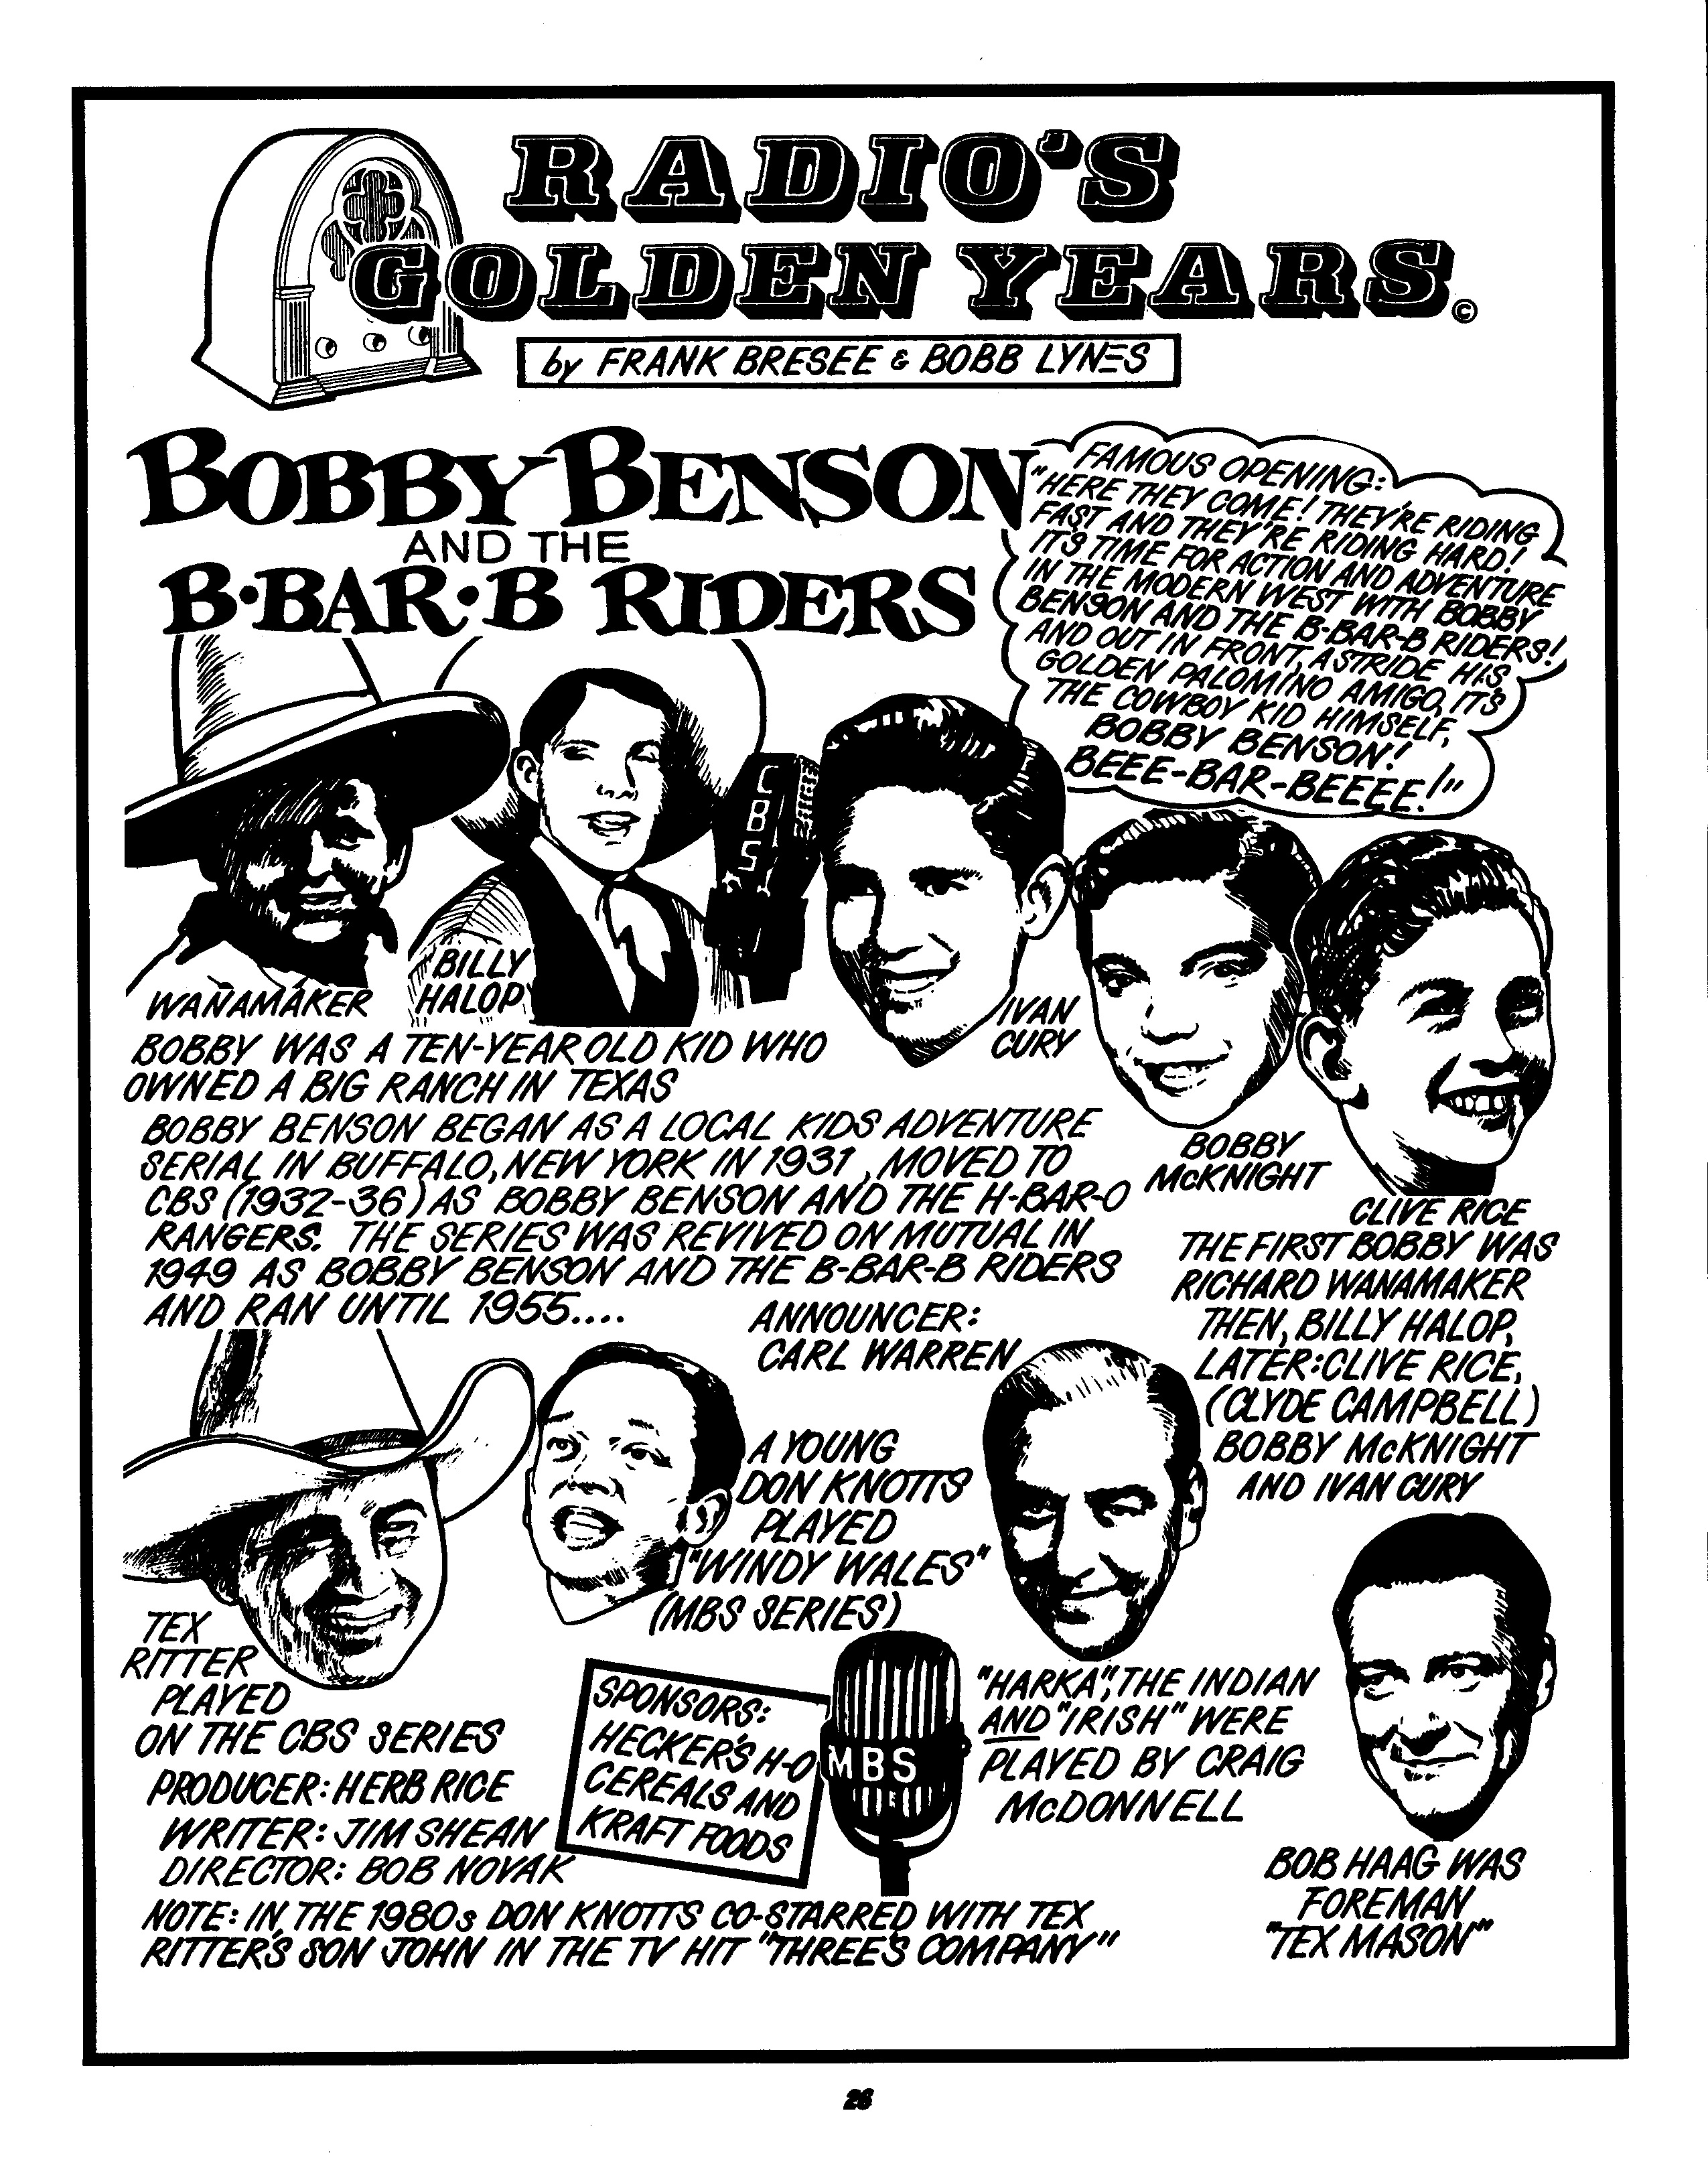 Bobby Benson